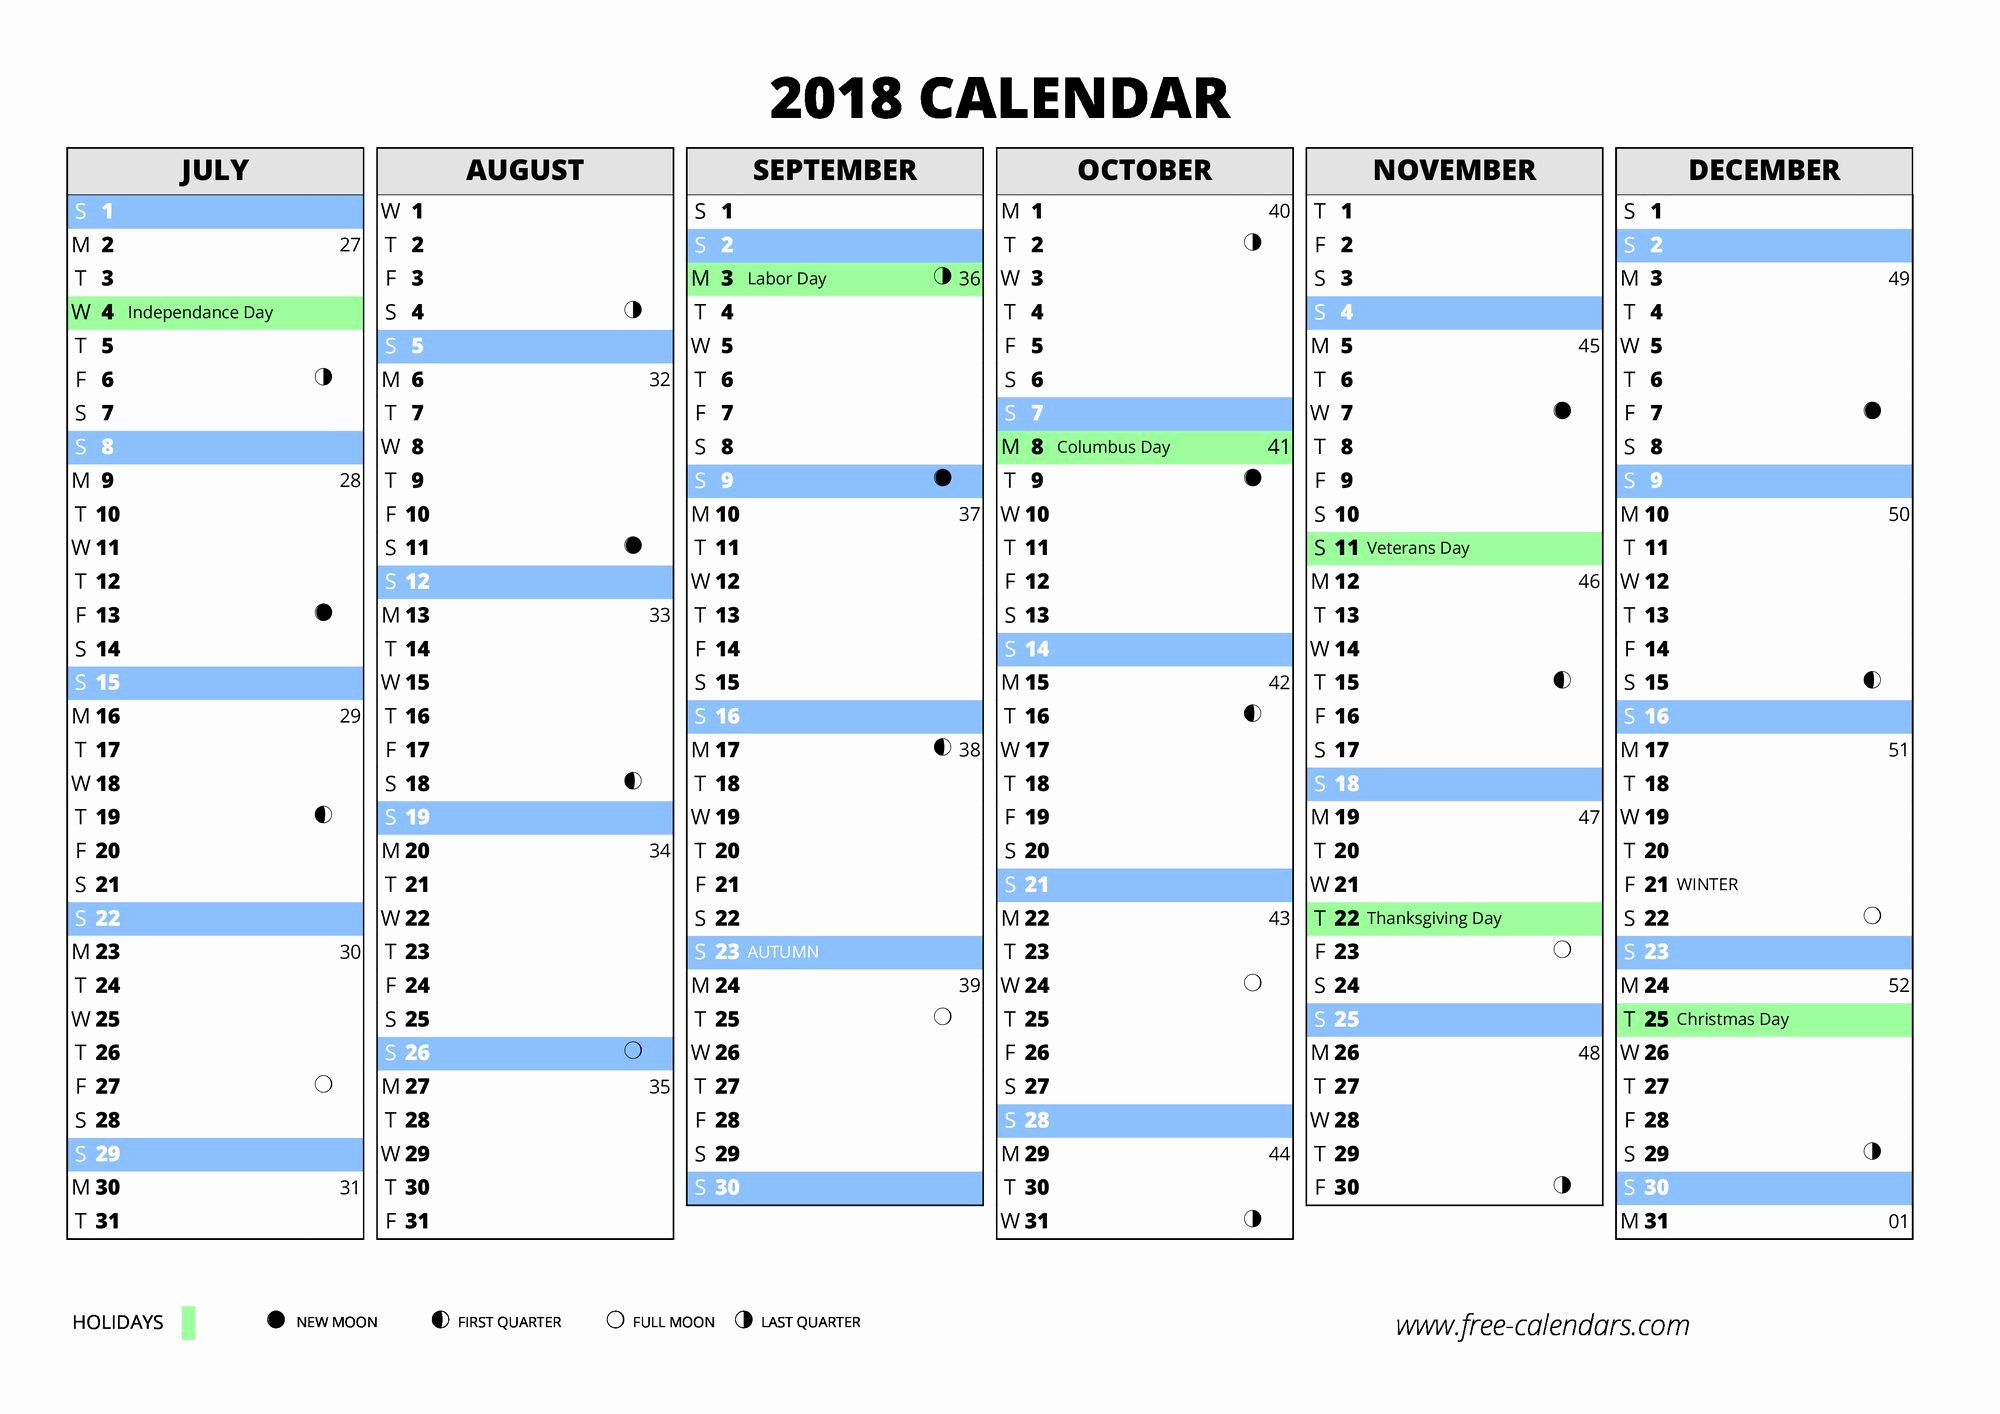 Excel Calendar Schedule Template Fresh 2018 Weekly Calendar Template Excel